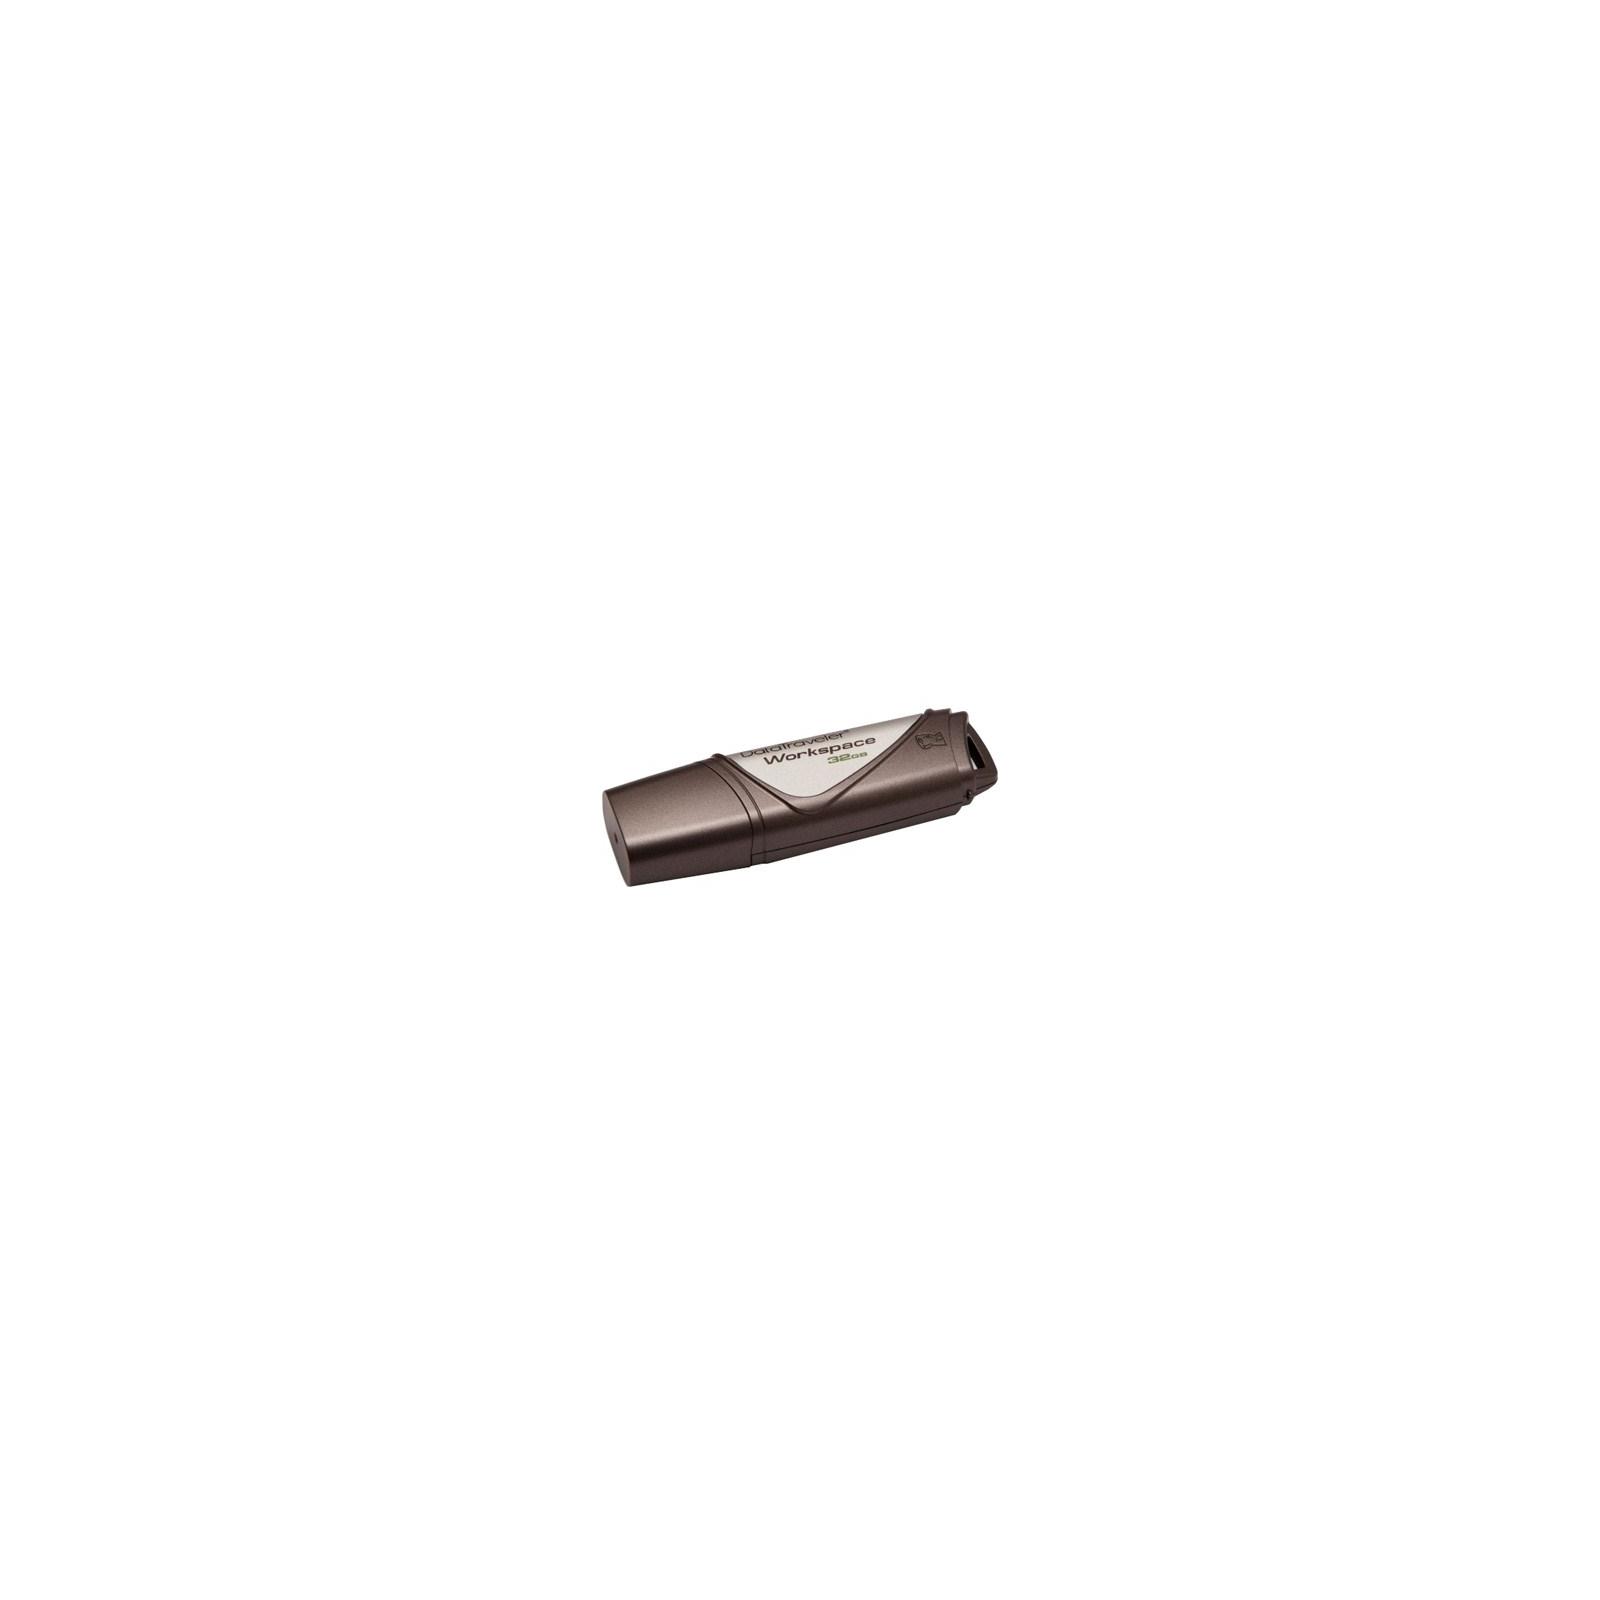 USB флеш накопитель Kingston 32Gb DataTraveler Workspace (DTWS/32GB)